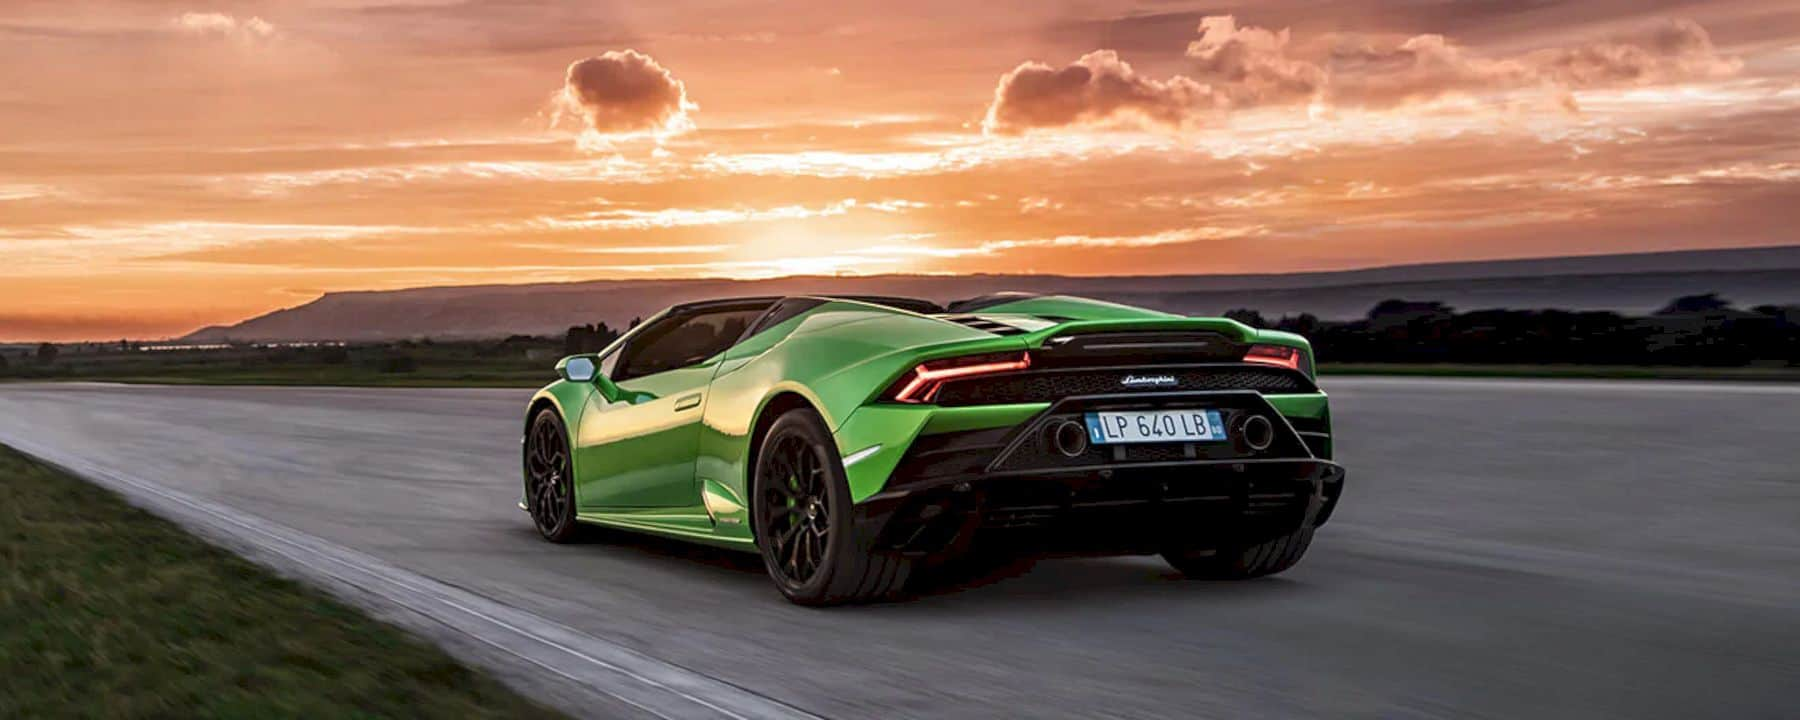 Lamborghini Huracan Evo Spyder 4